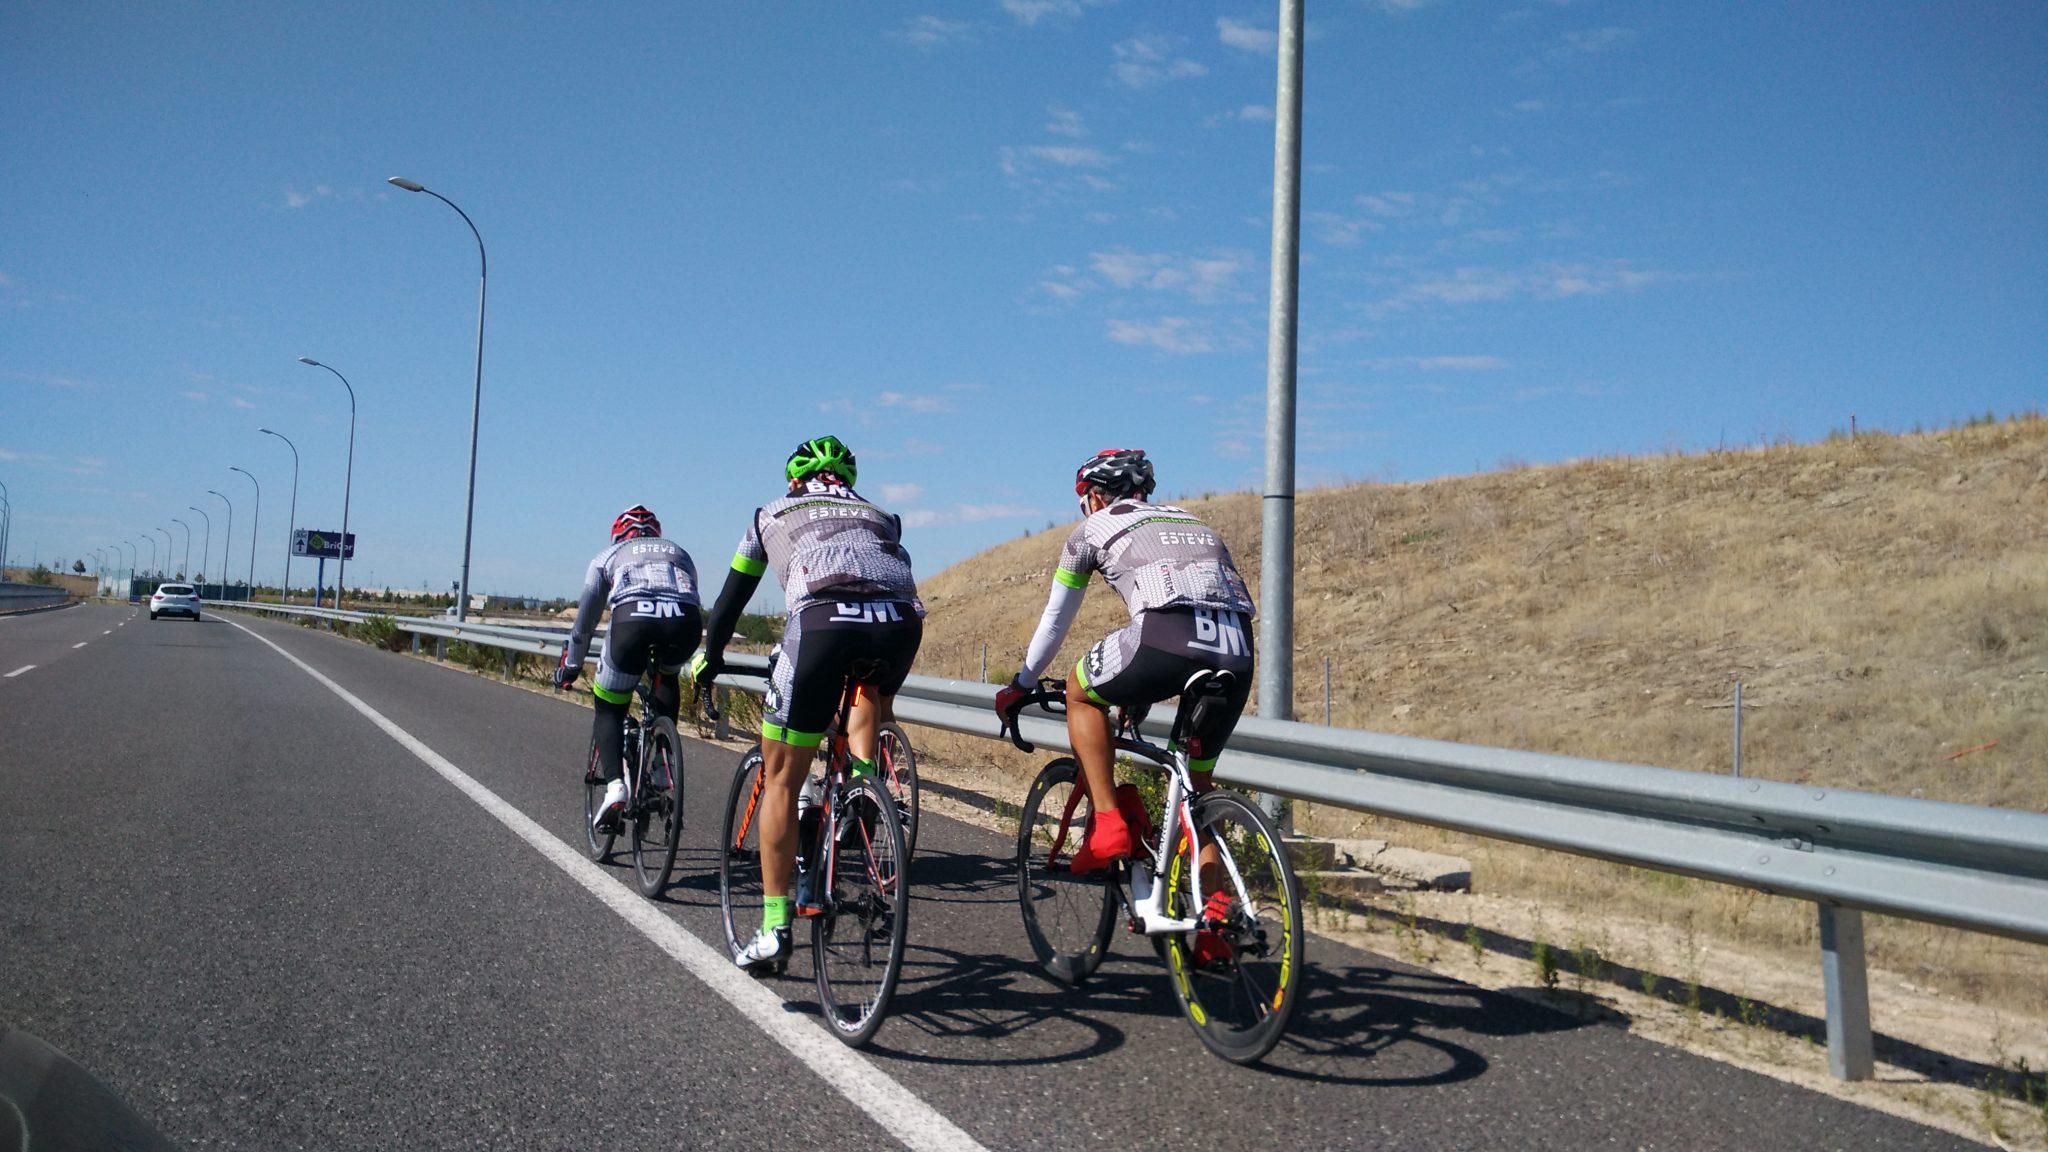 Grupeta_BM_Salida_Morata_Tajuña_16092017_4_Biciletas Mañas BM-Tienda-de-venta-y-reparacion-de-bicicletas-Ridley-Madrid